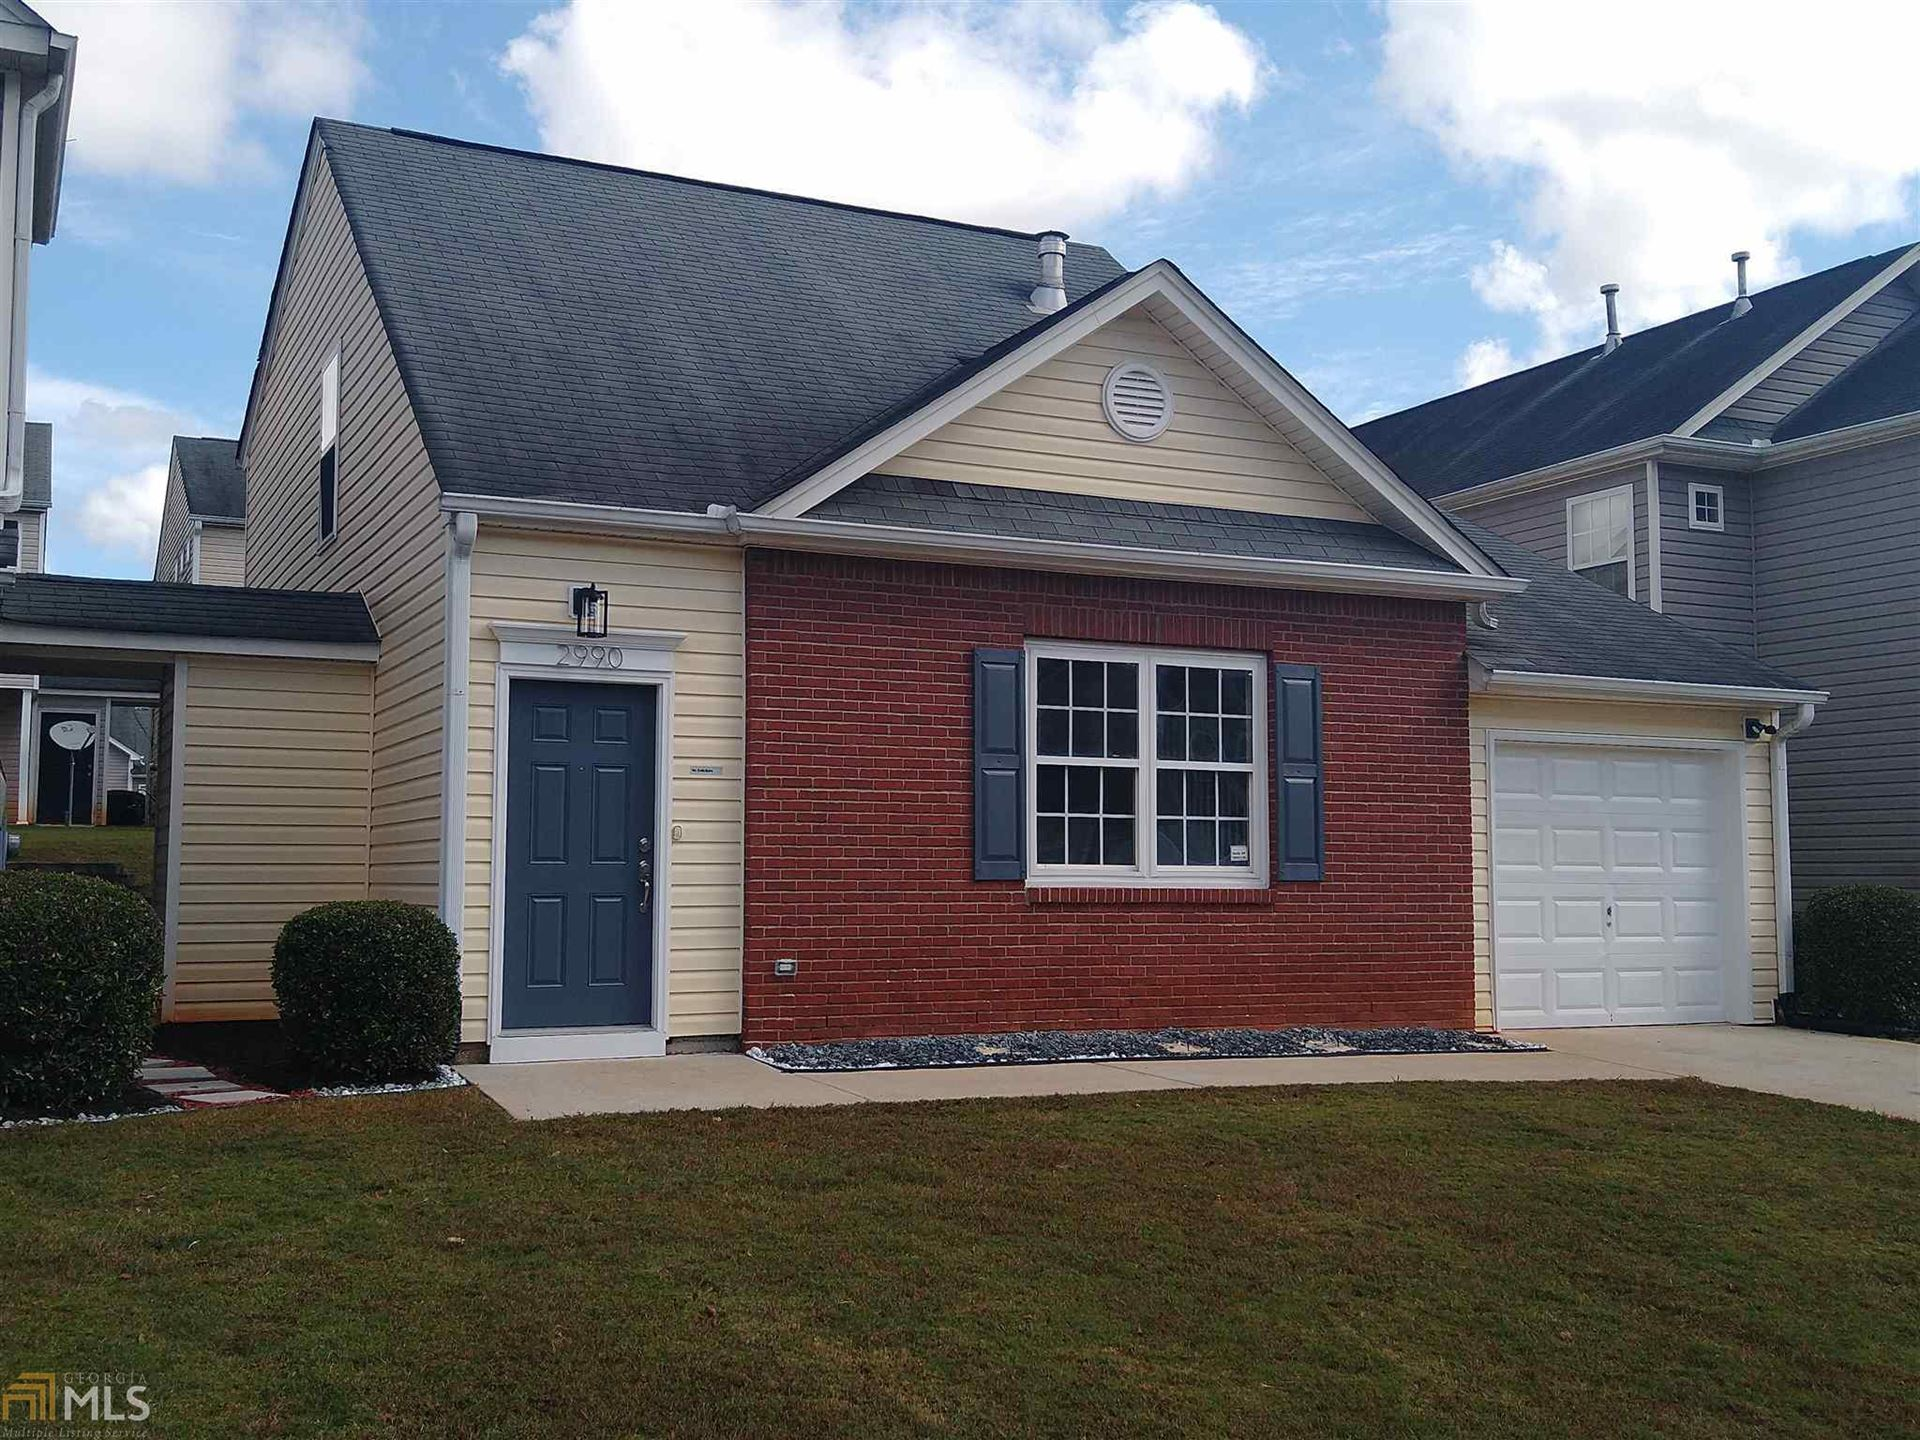 2990 Lakeside Cir, Covington, GA 30016 - MLS#: 8891857